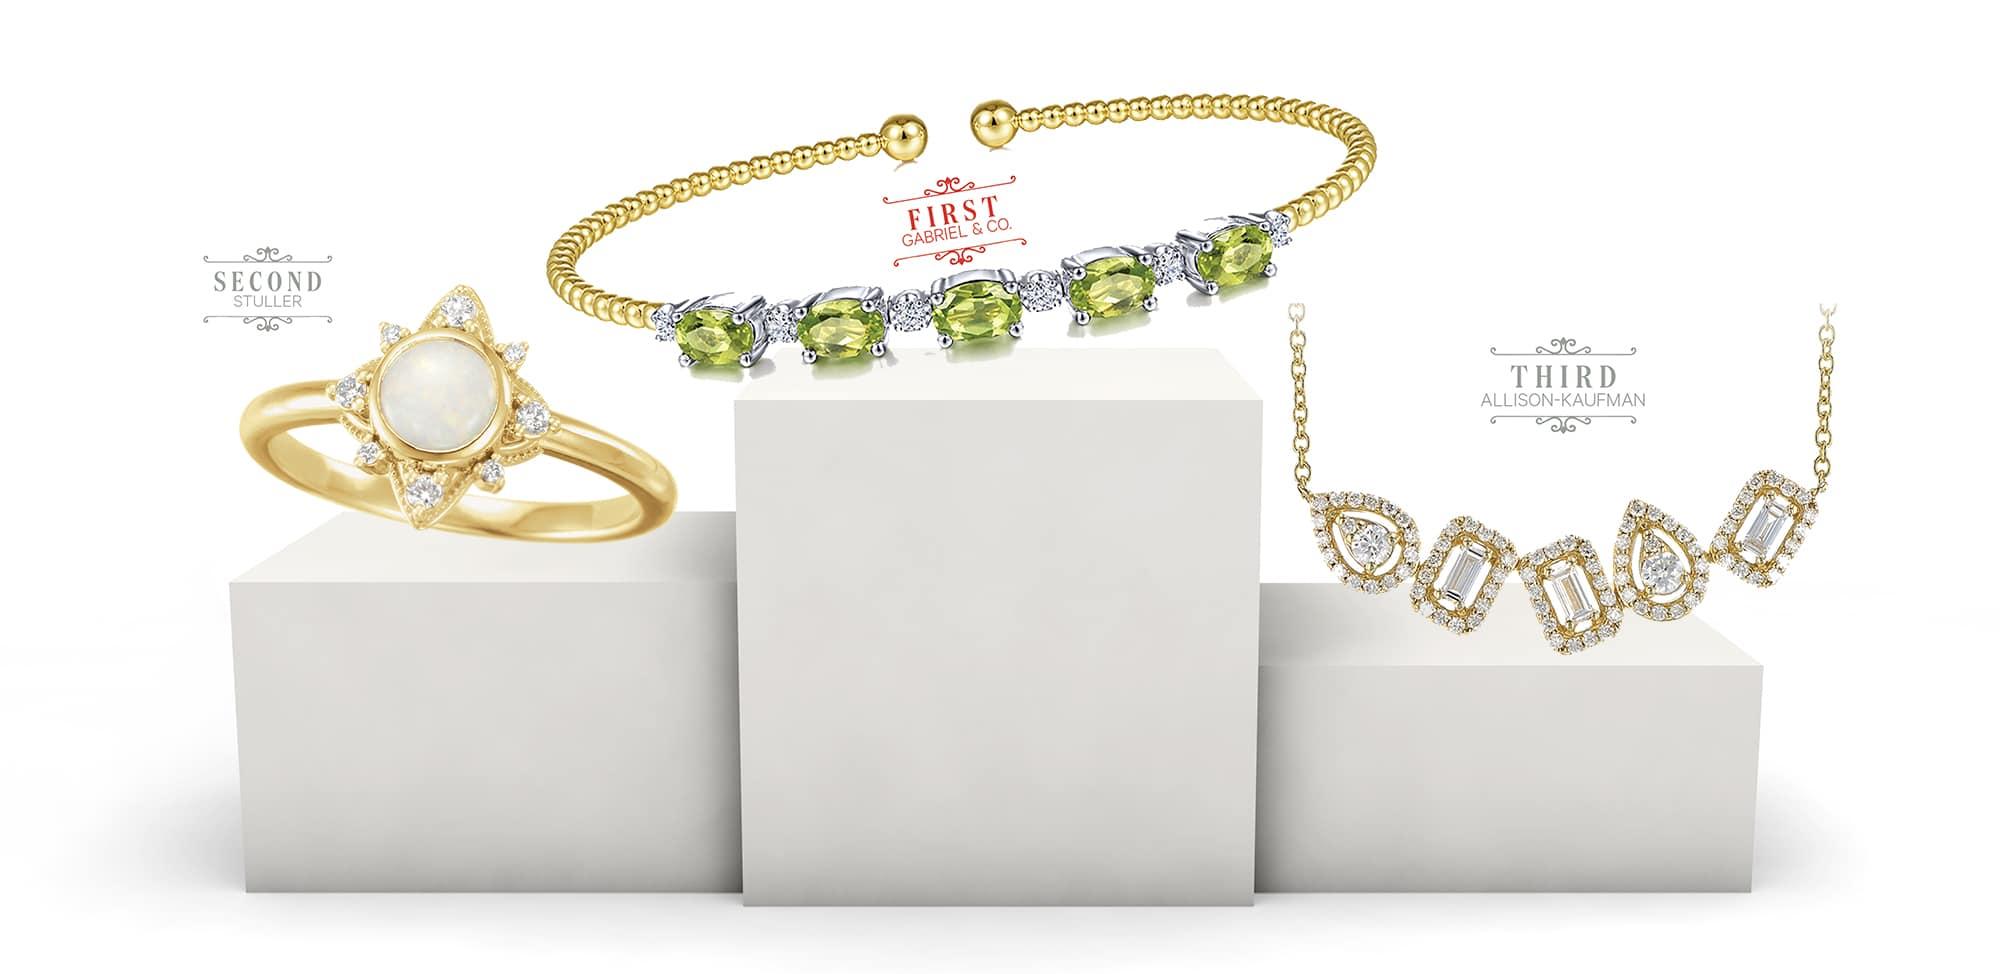 Big Siuvey top 3 jewelry brands